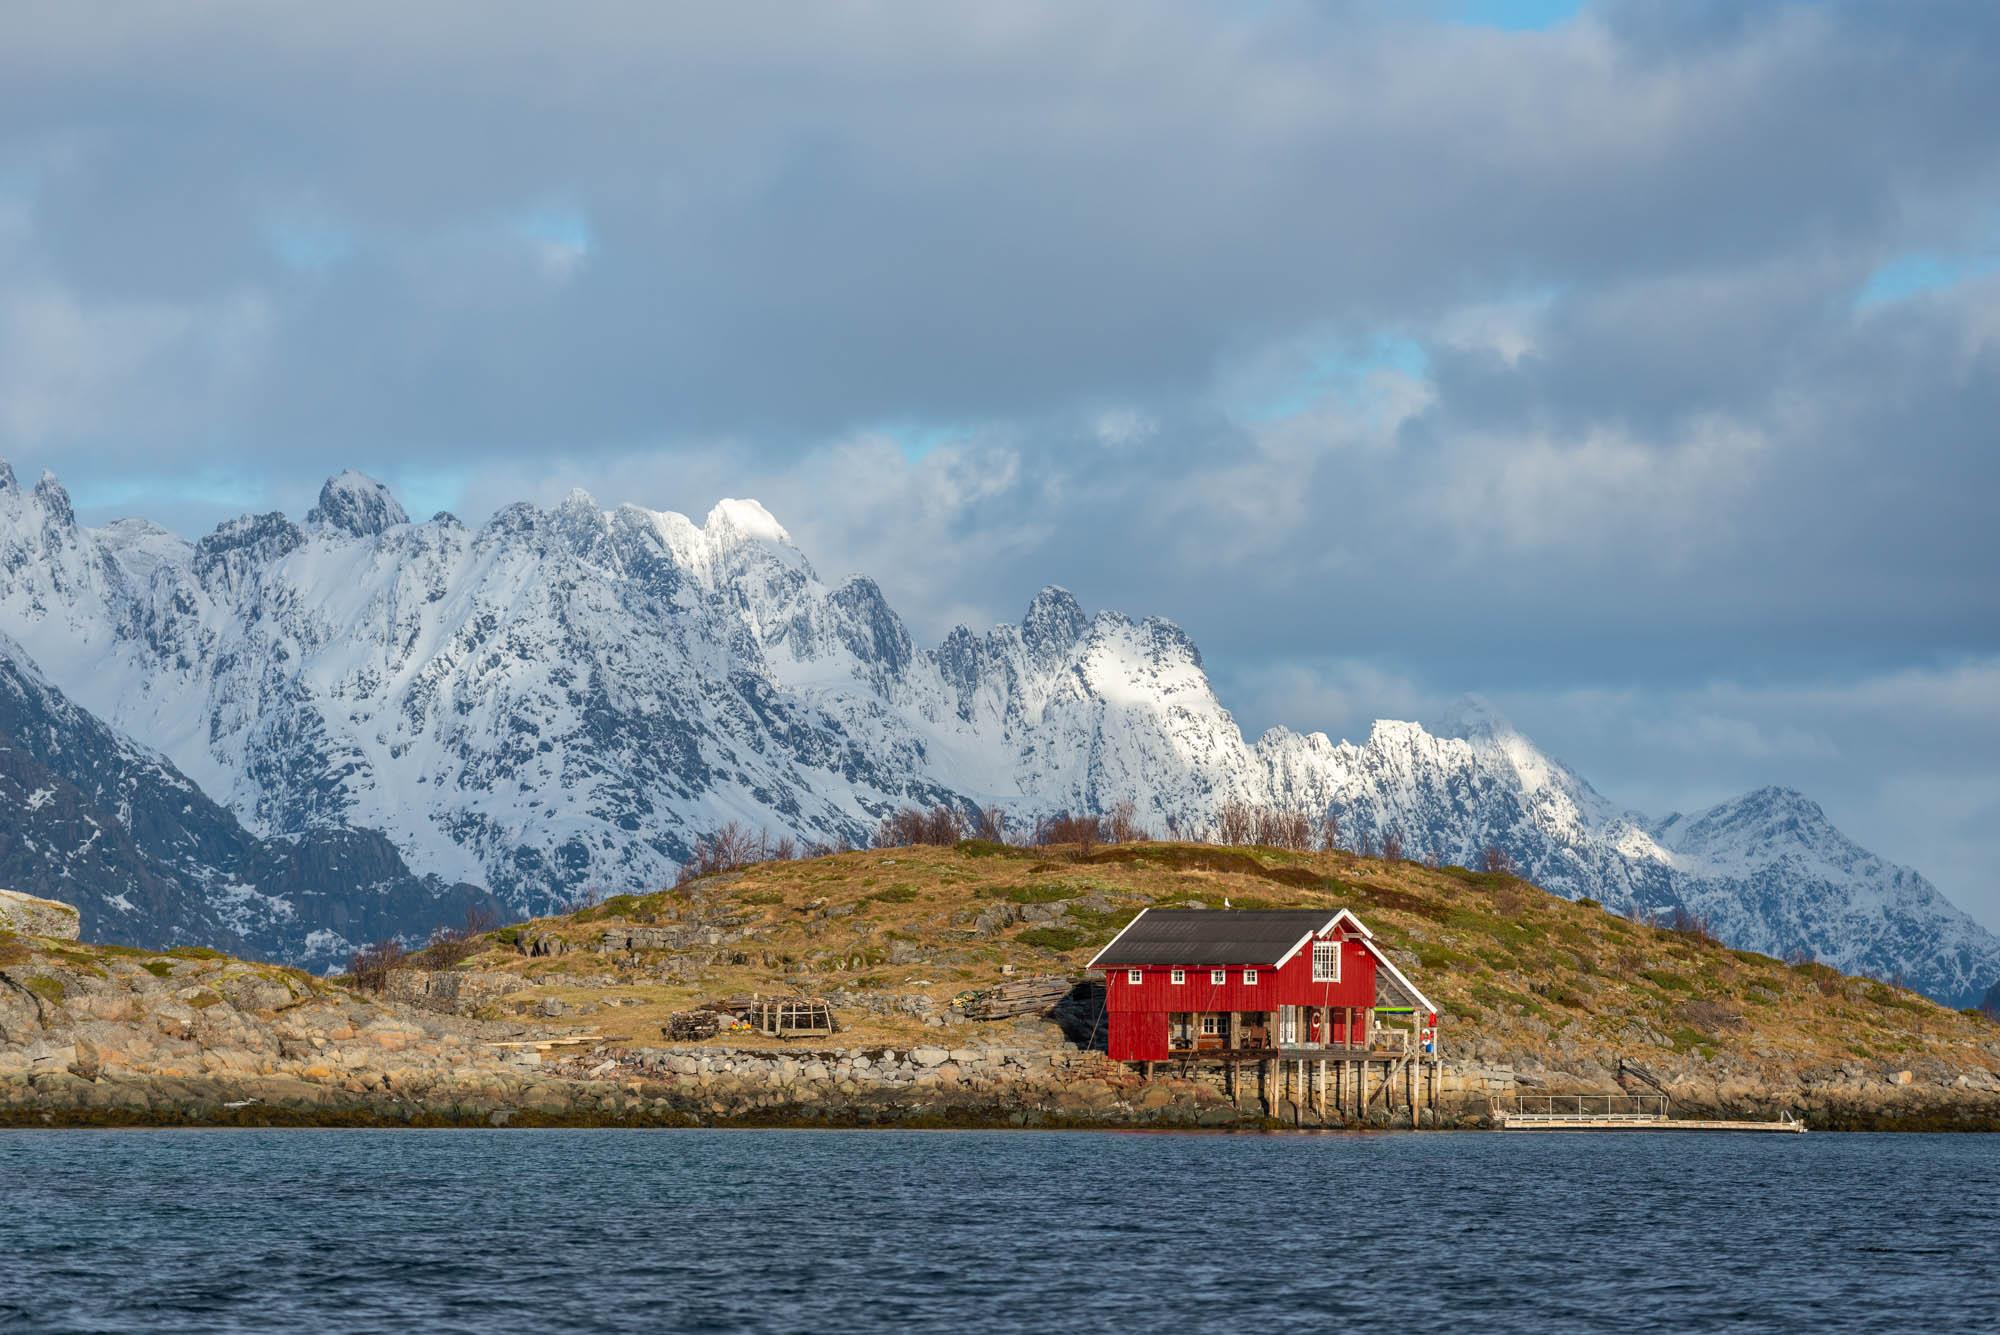 Norvegia, a caccia di aquile di mare & merluzzi